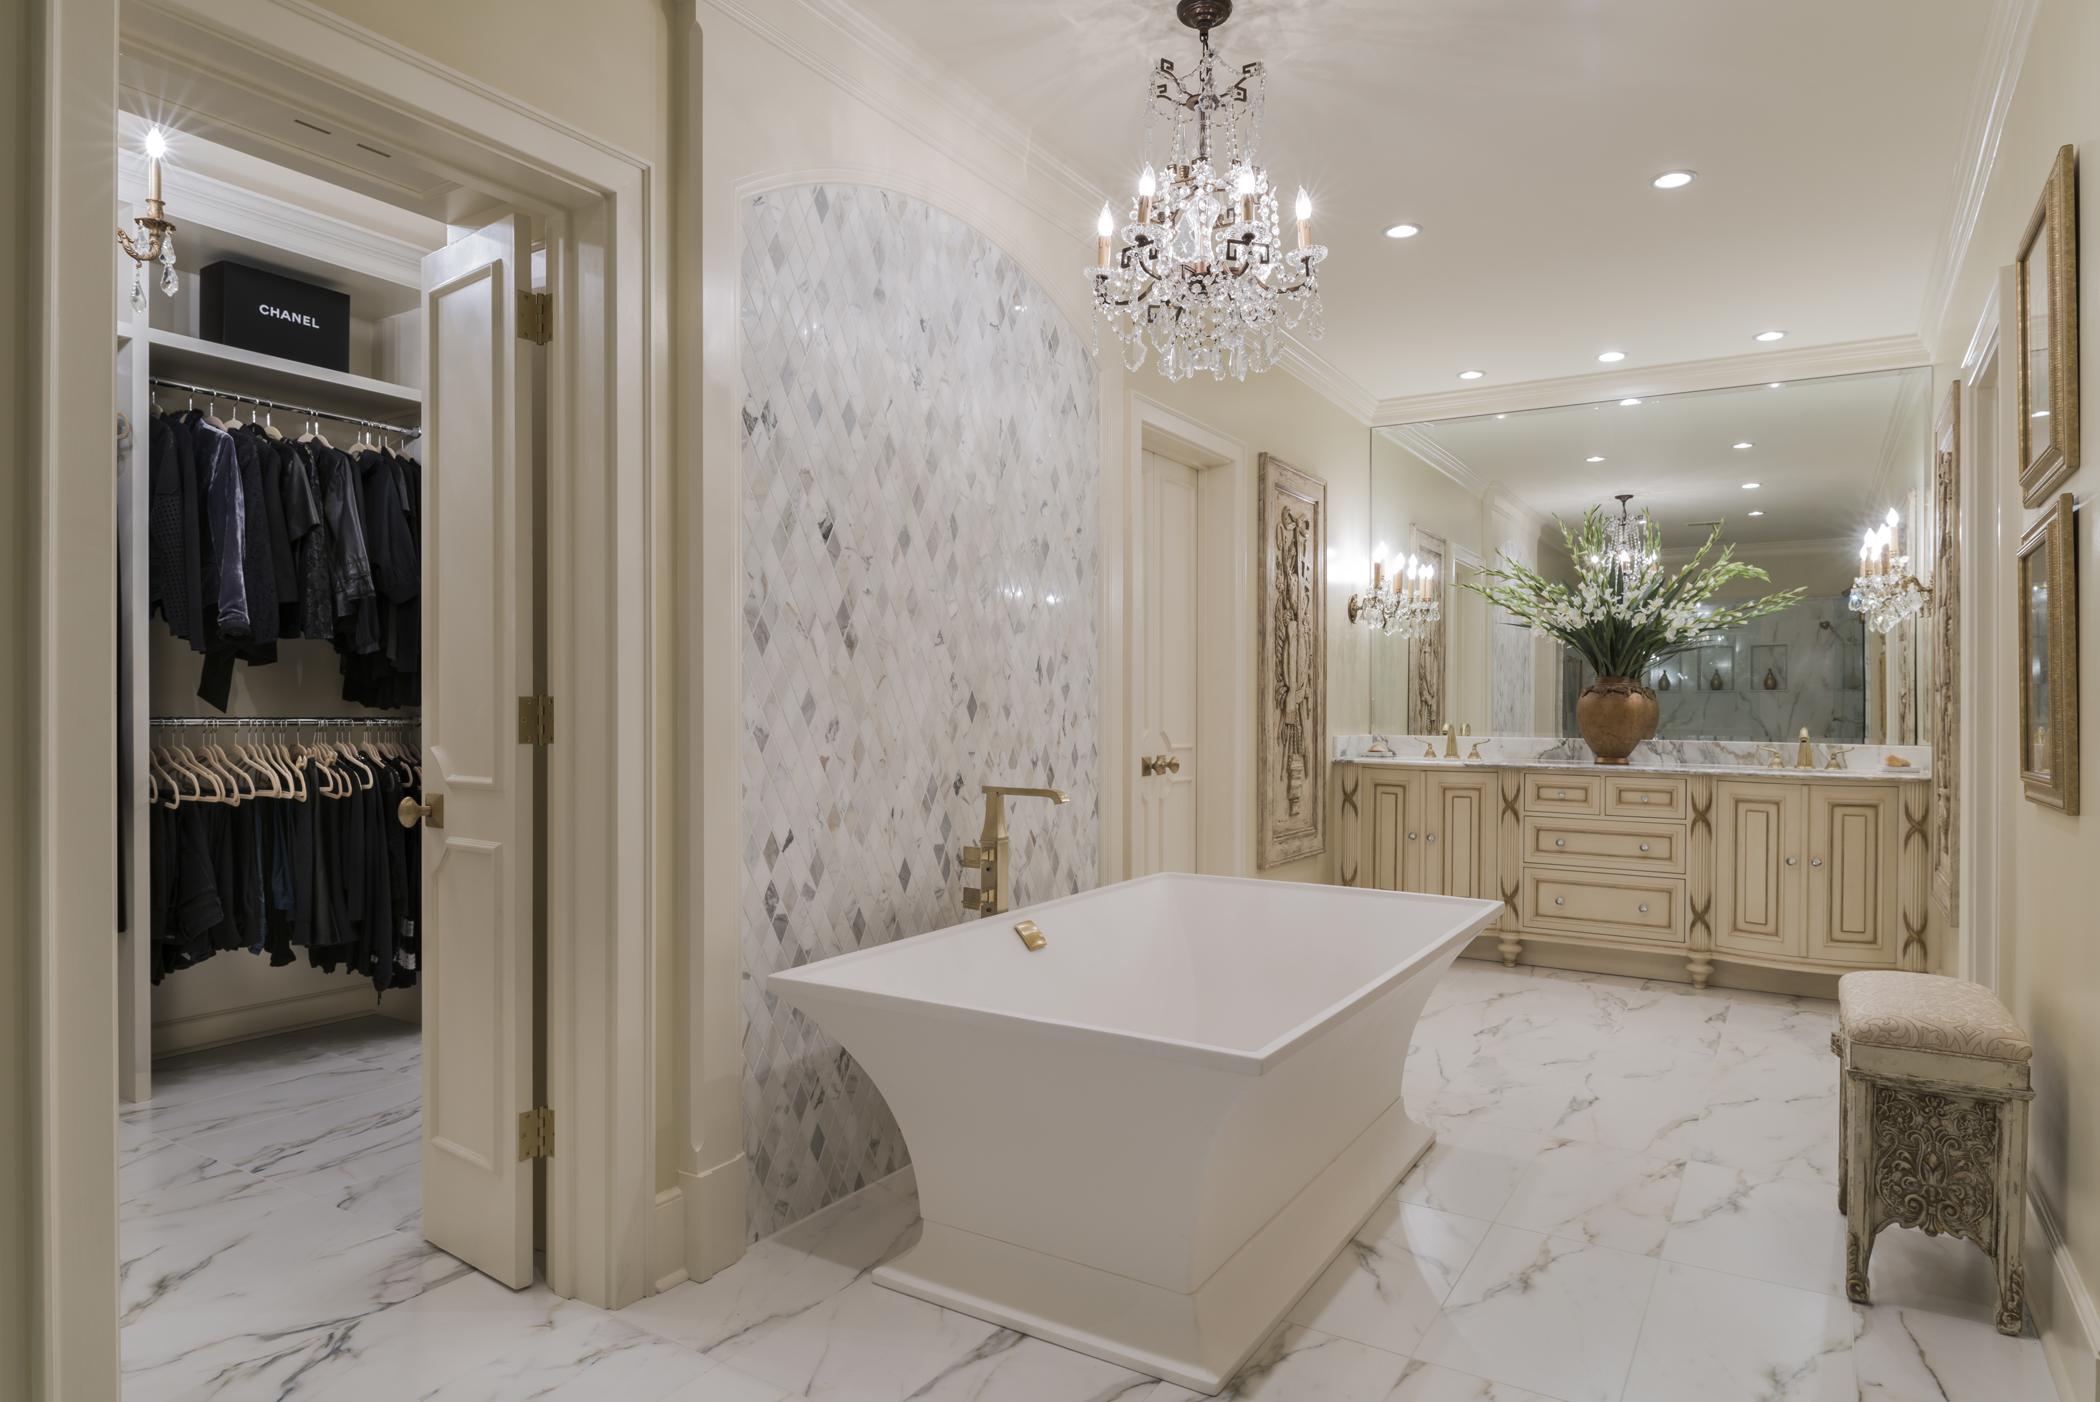 Memphis, TN, USA Renovating A Master Bath Into A Cohesive Master Suite